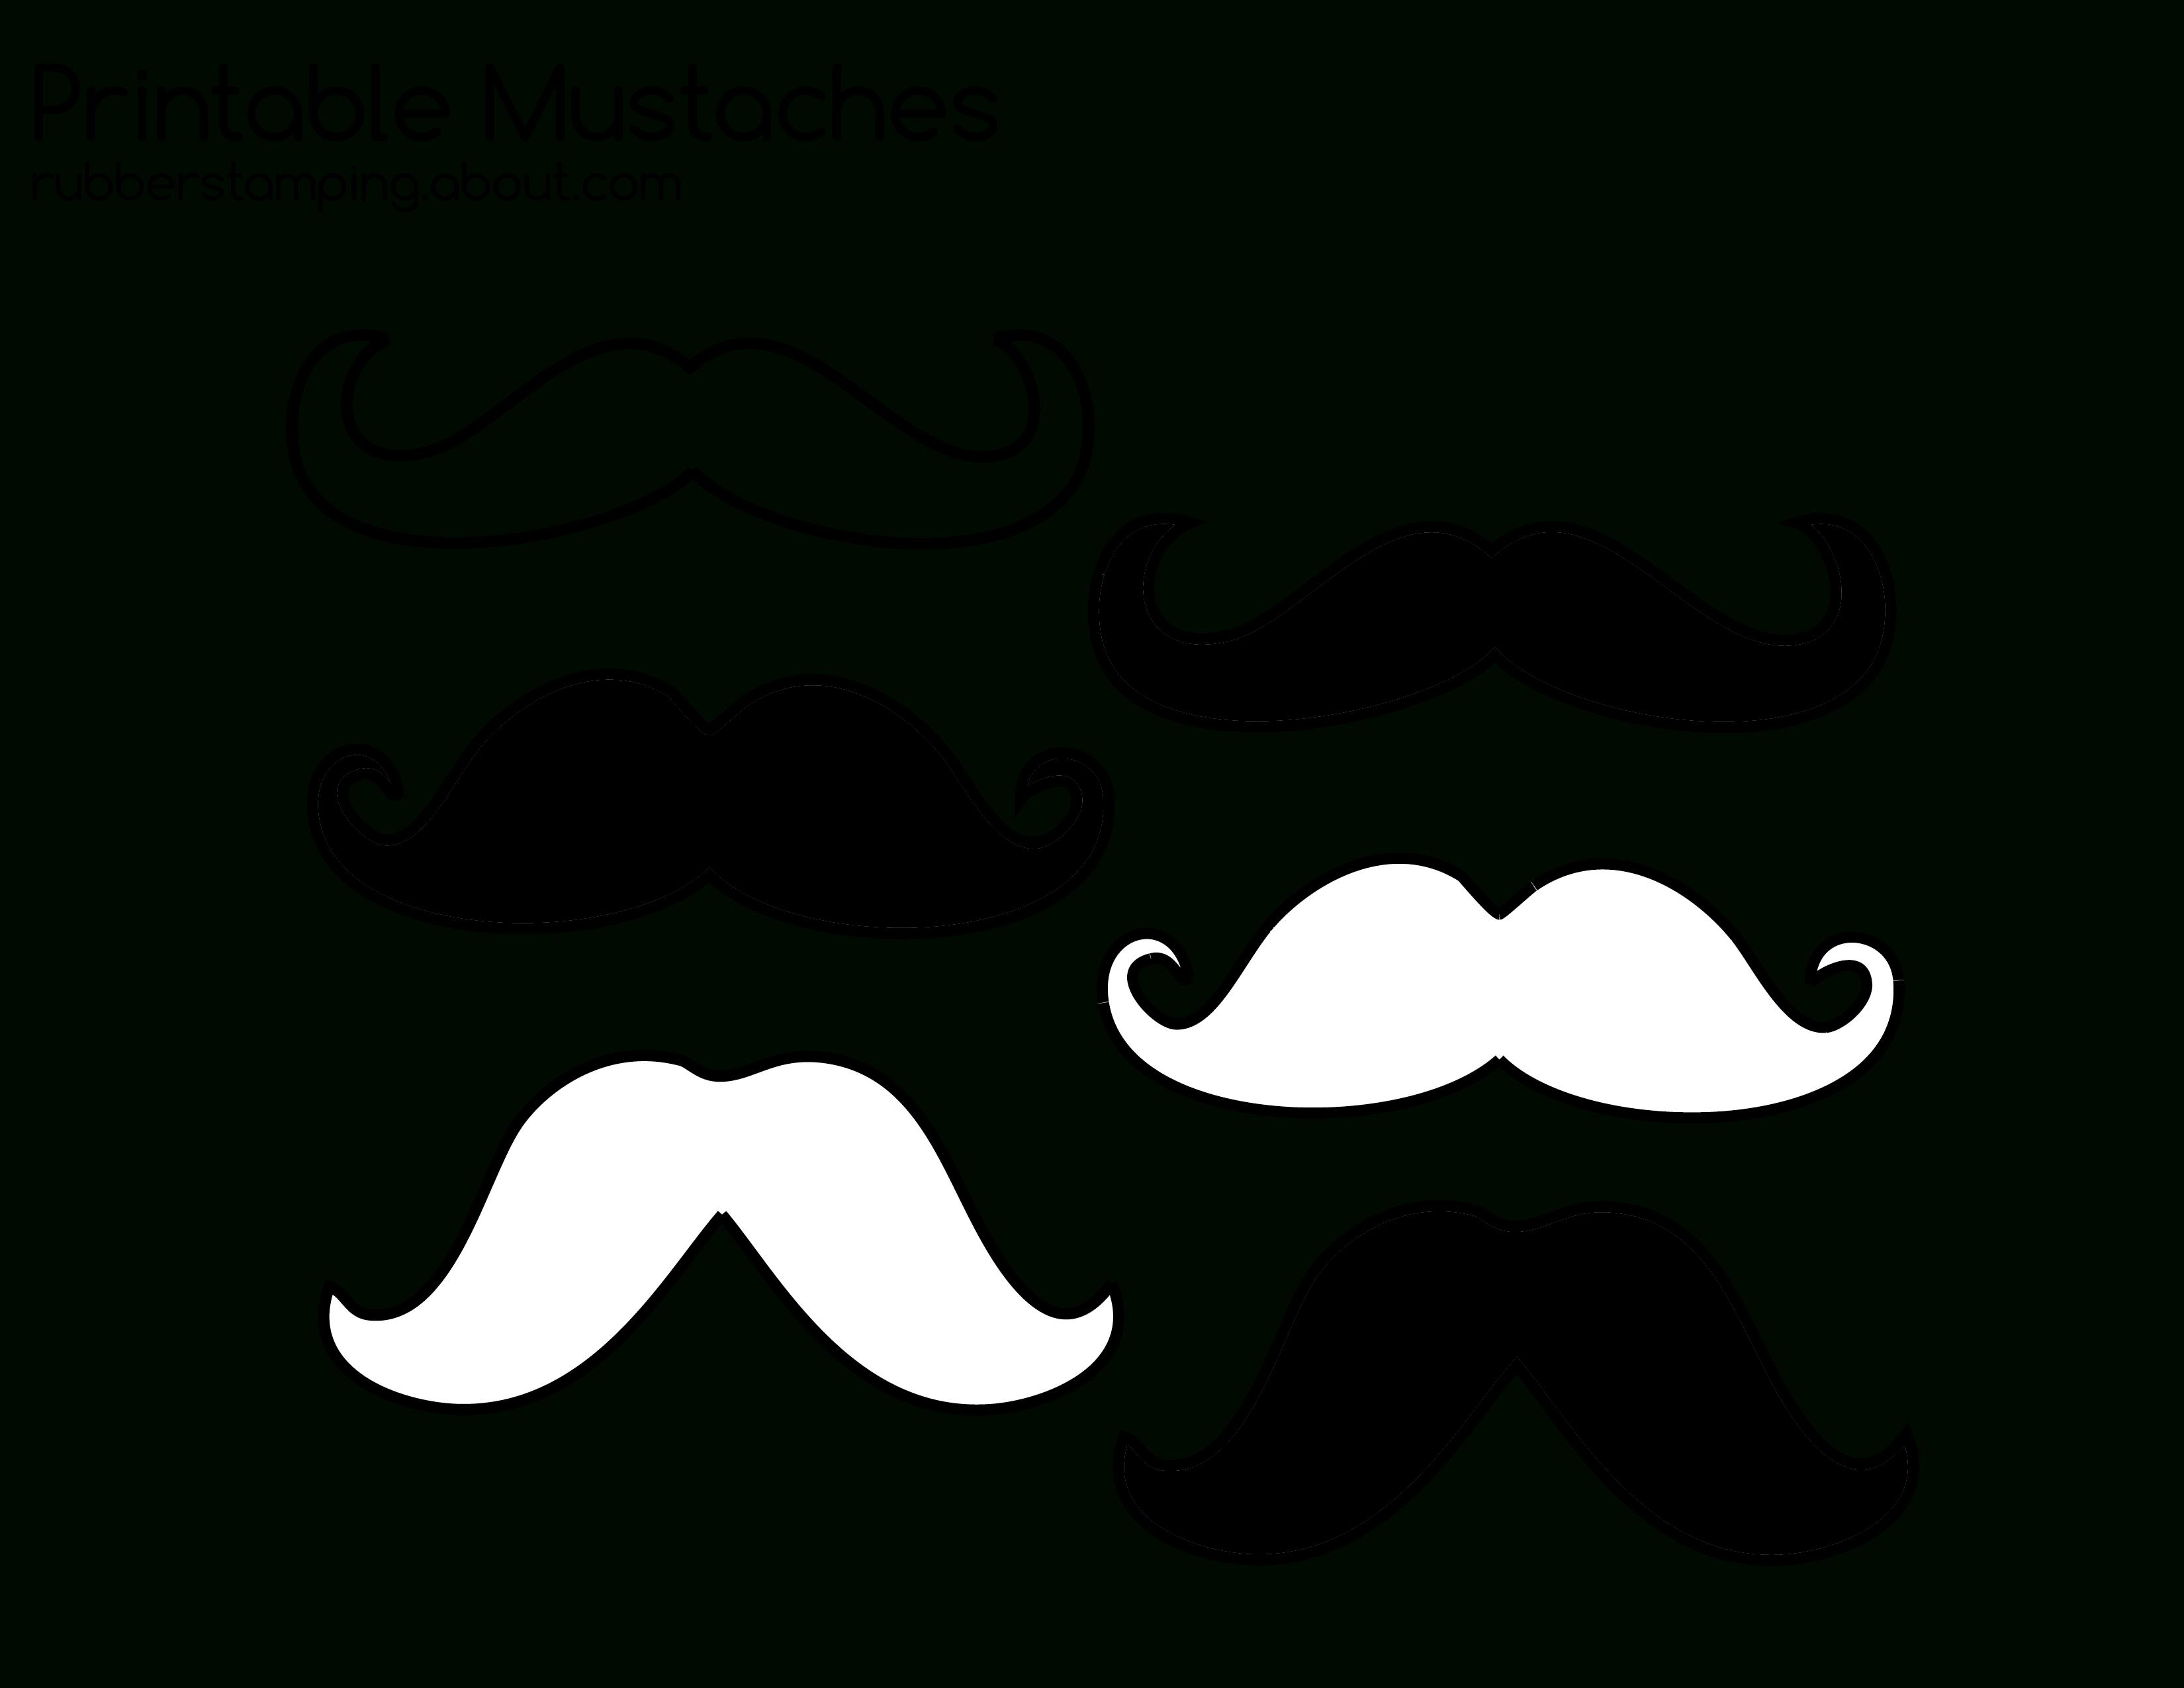 Free Printable Mustache Images | Diy | Mustache Crafts, Mustache - Free Printable Mustache